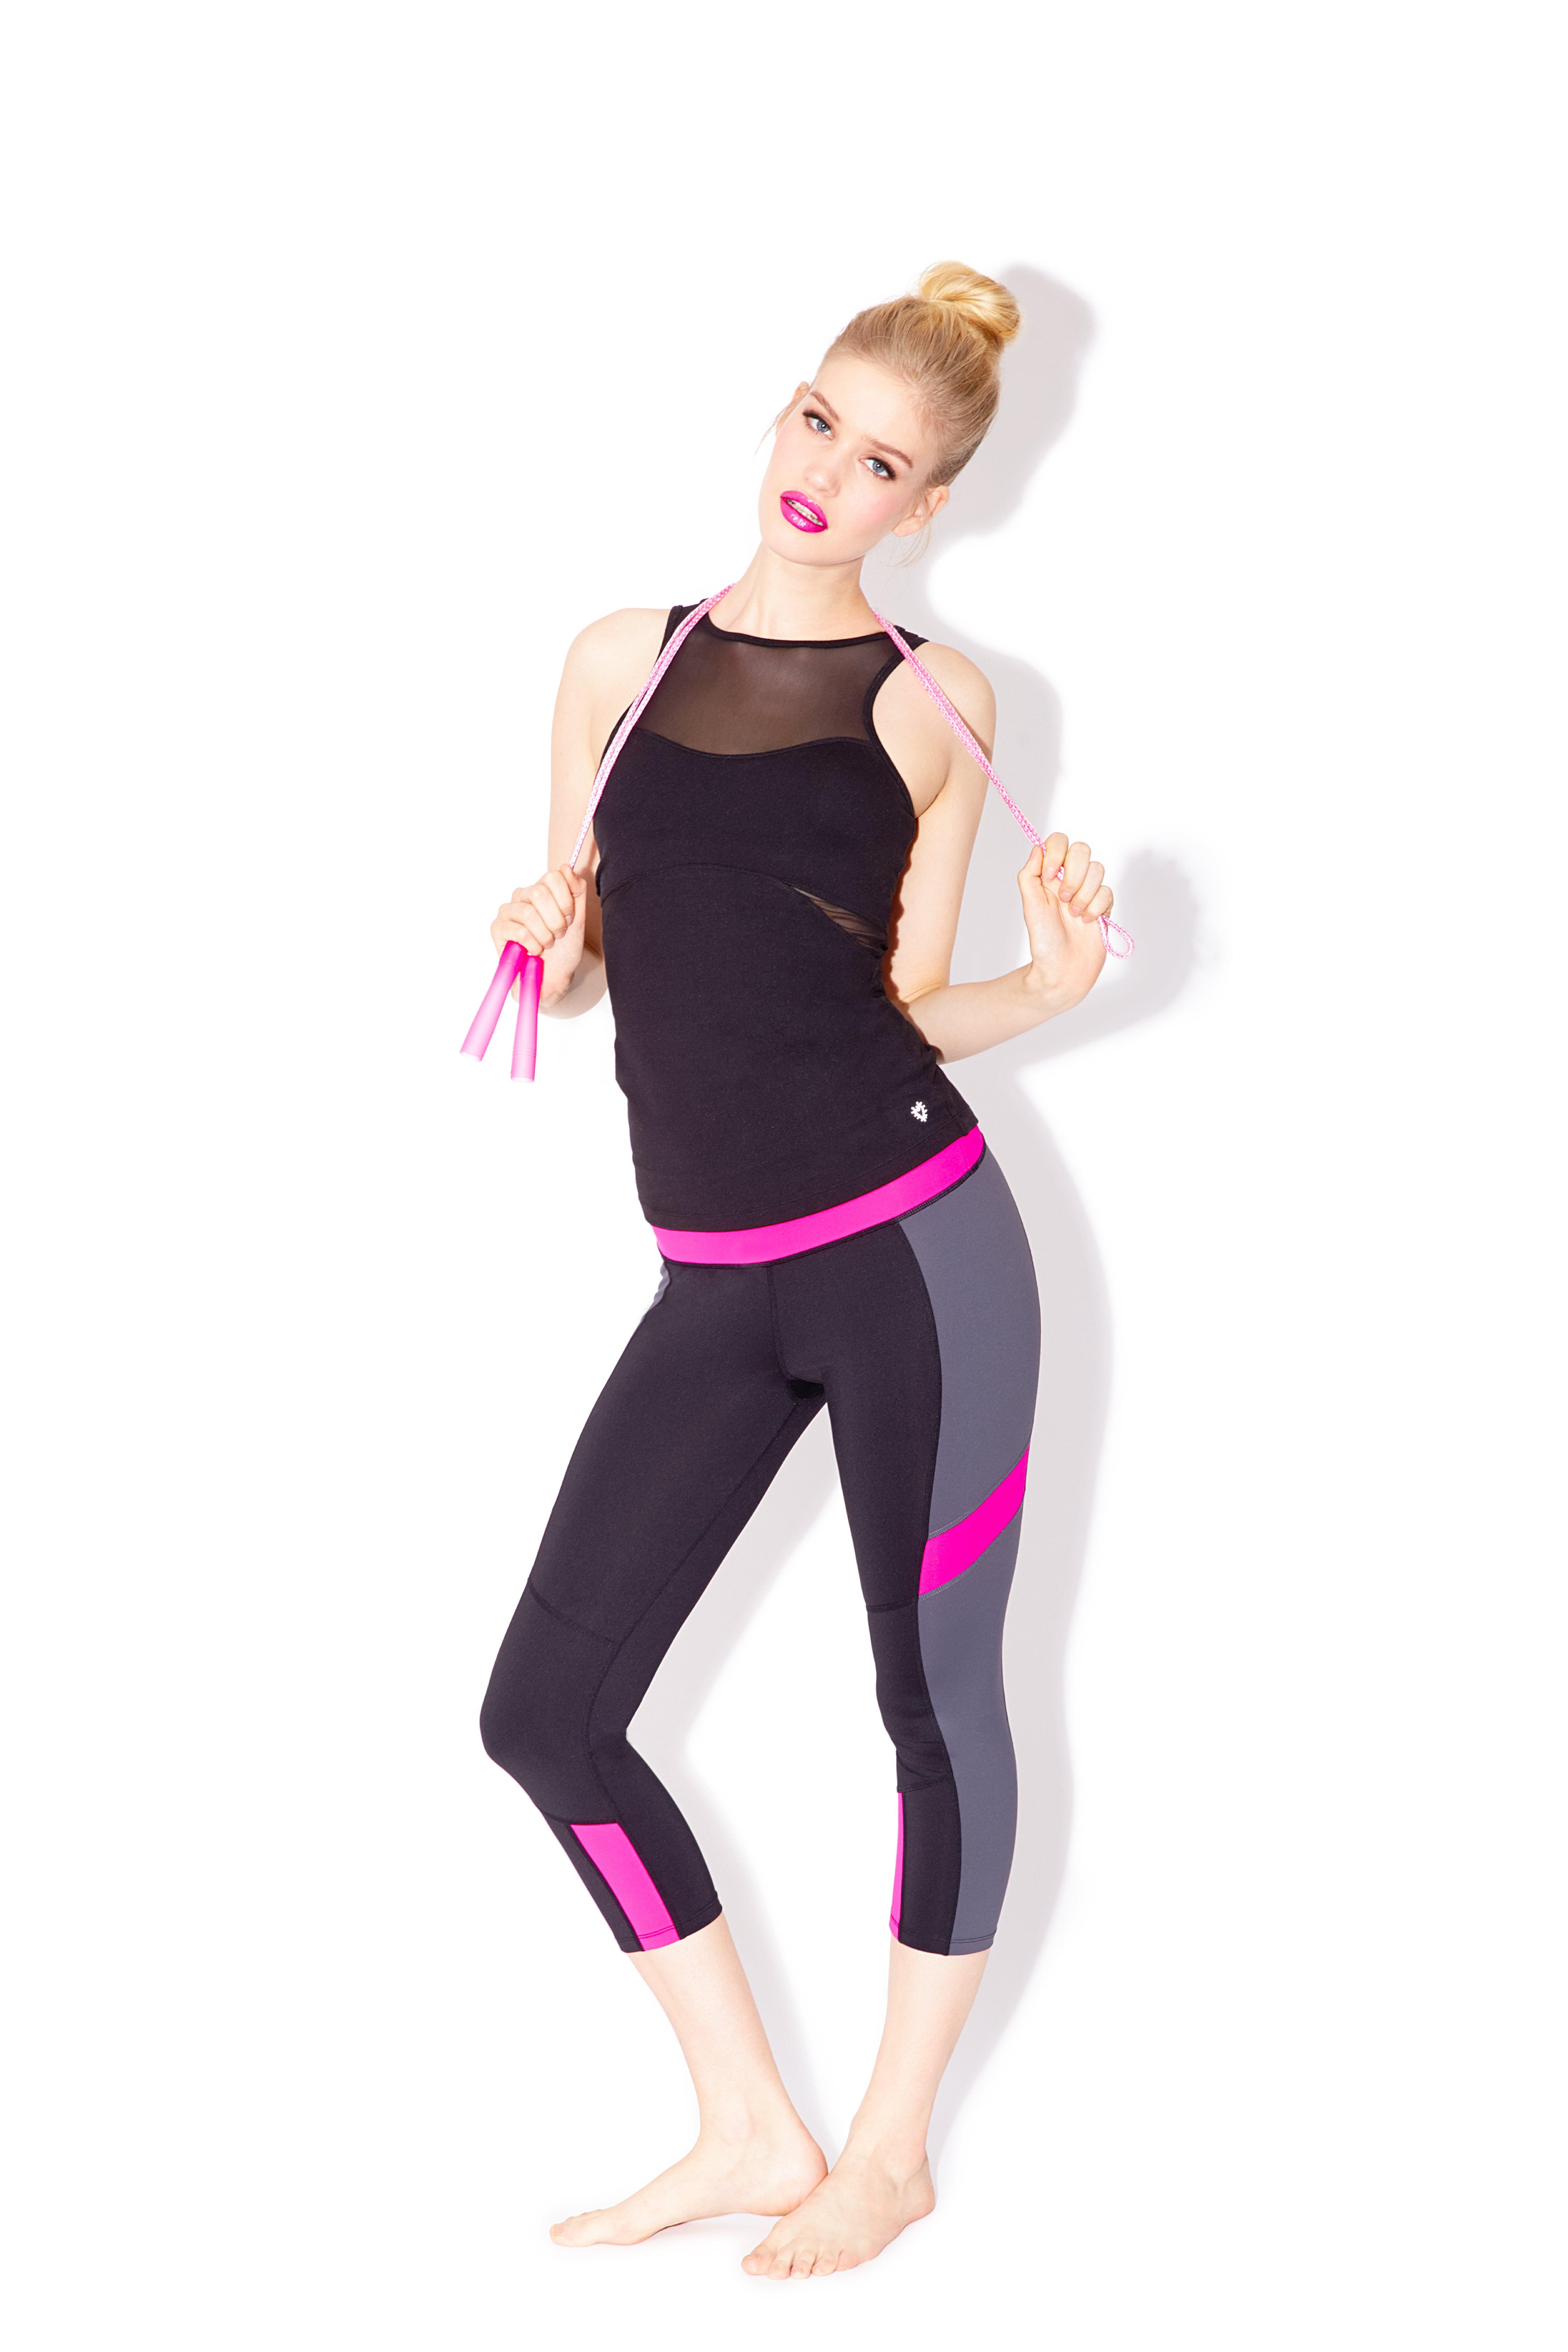 Betsey Johnson Activewear Designer Workout Clothes